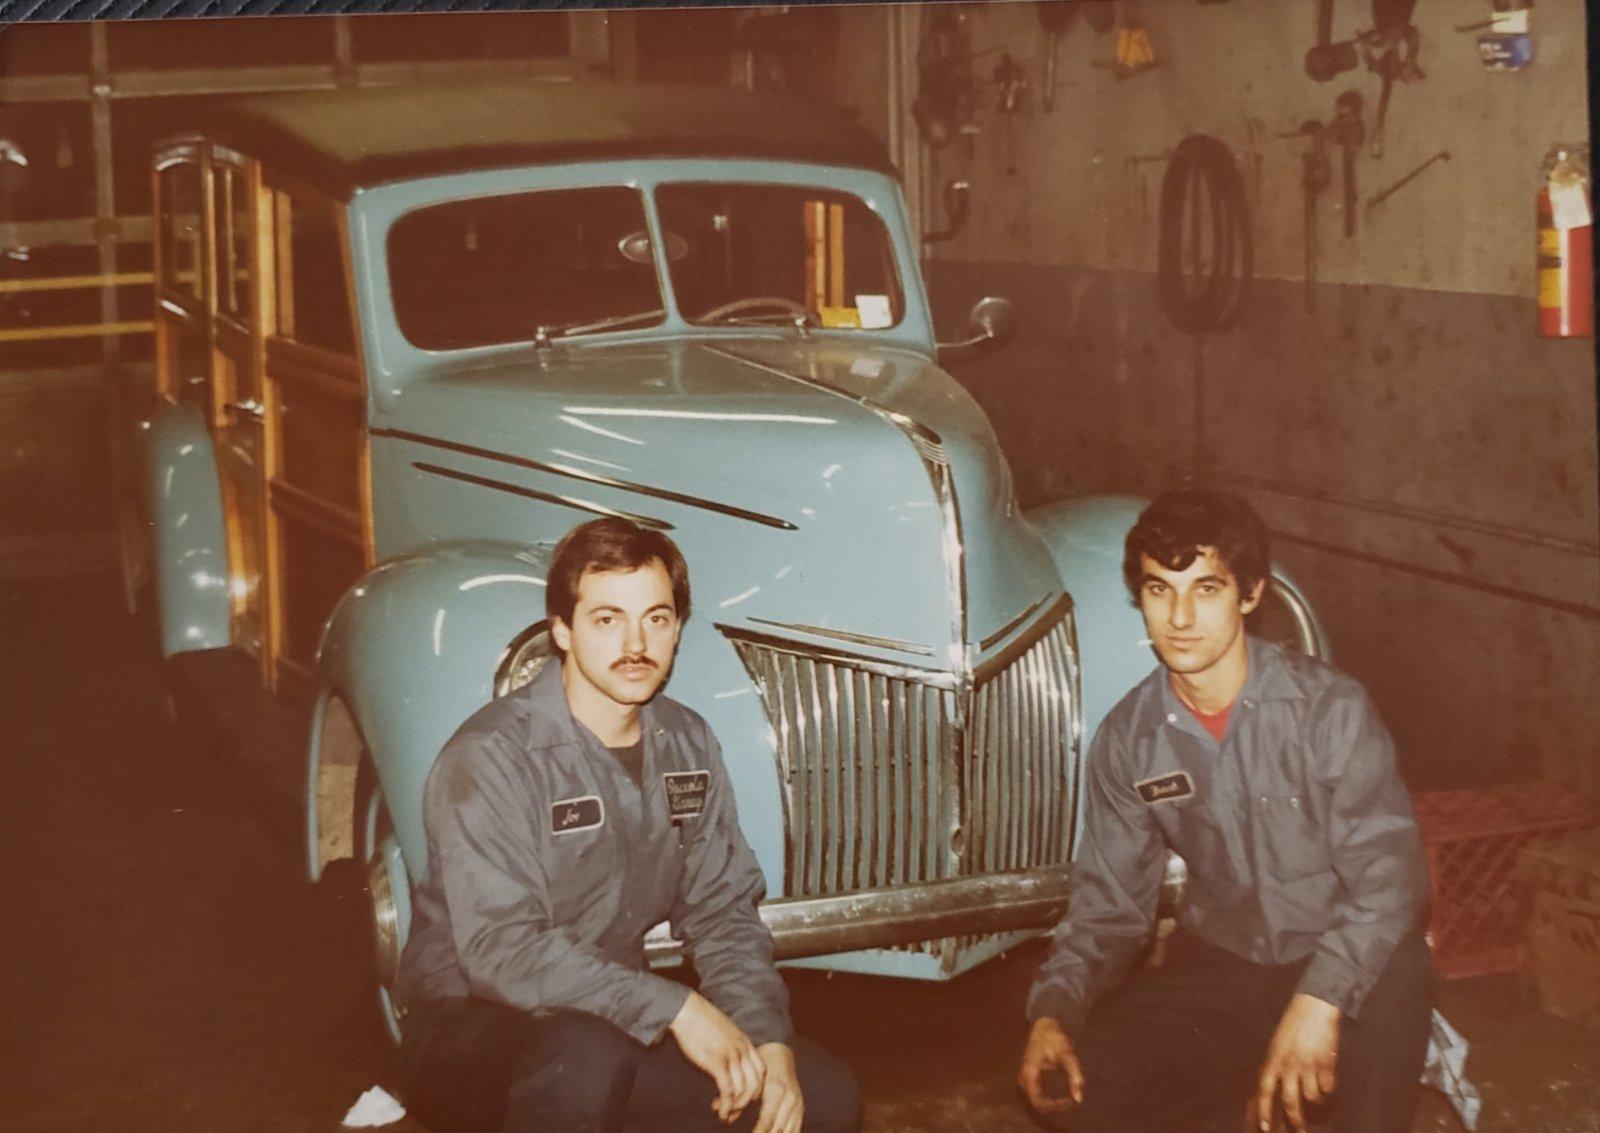 Joe Marconi and technician Franco, 1980